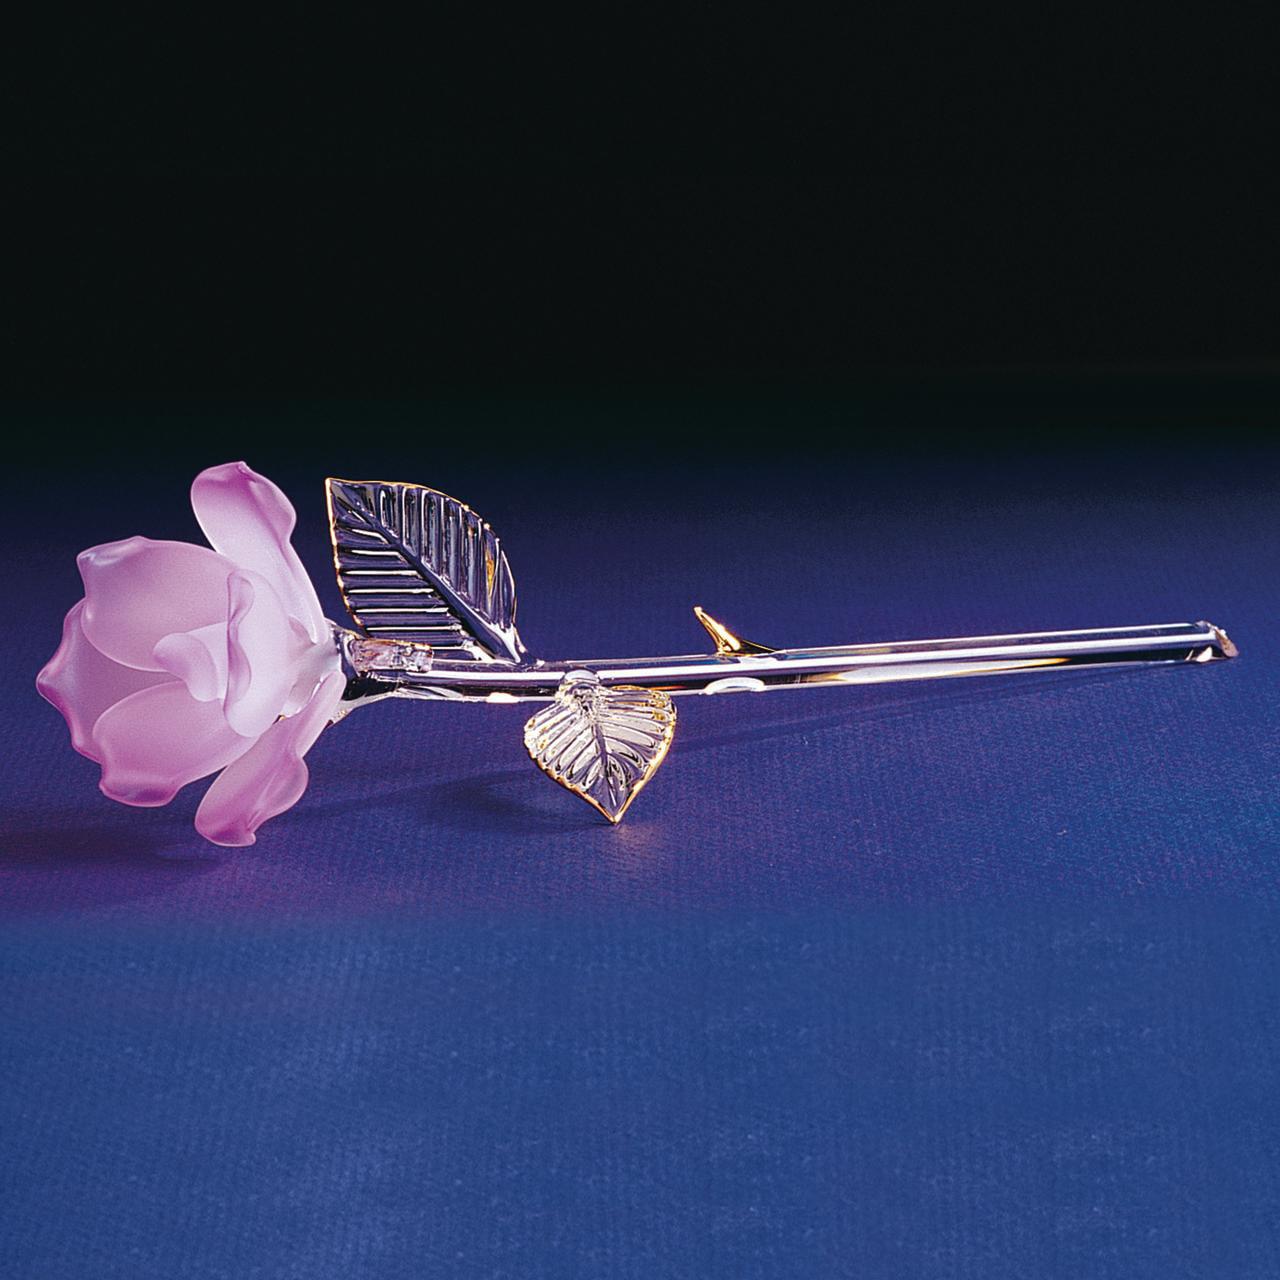 Lavender Rose Glass Figurine Floral Garden Nautical Keepsake Glas Baron Love Gifts For Women For Her